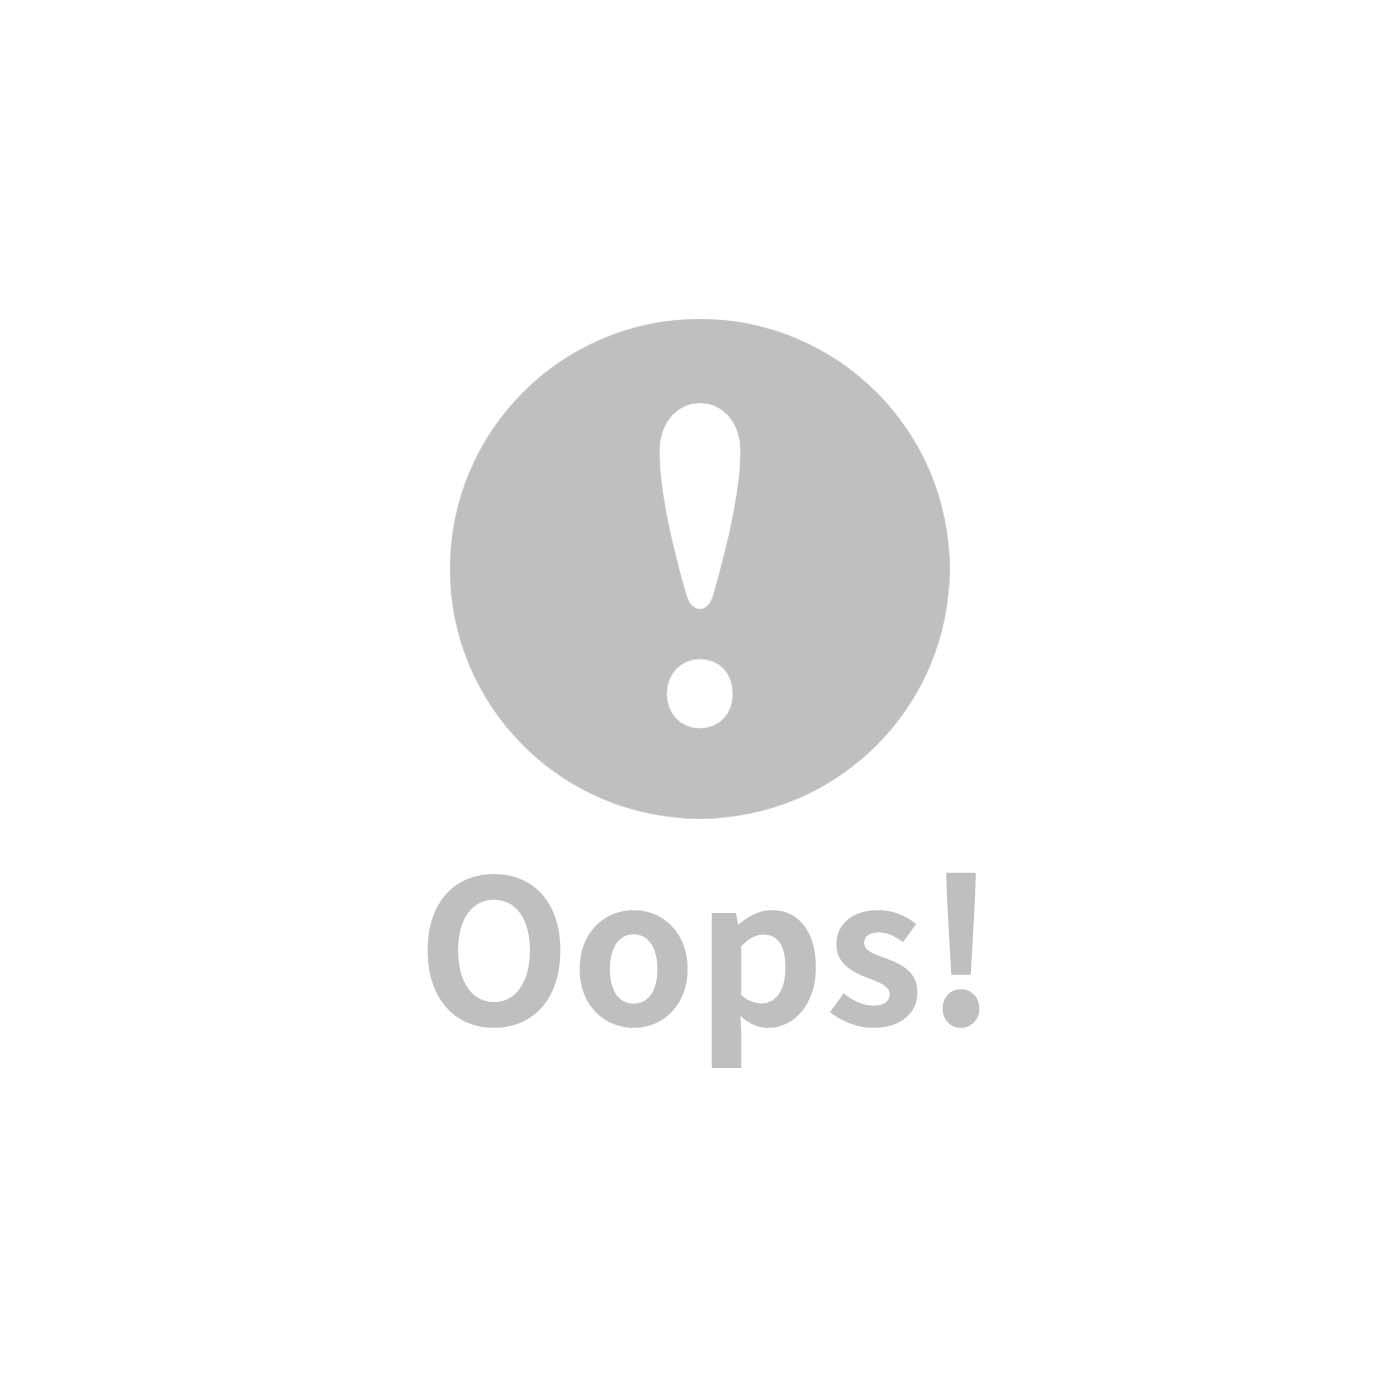 【彌月禮盒】La Millou 天使枕+豆豆小豬枕(多款可選)